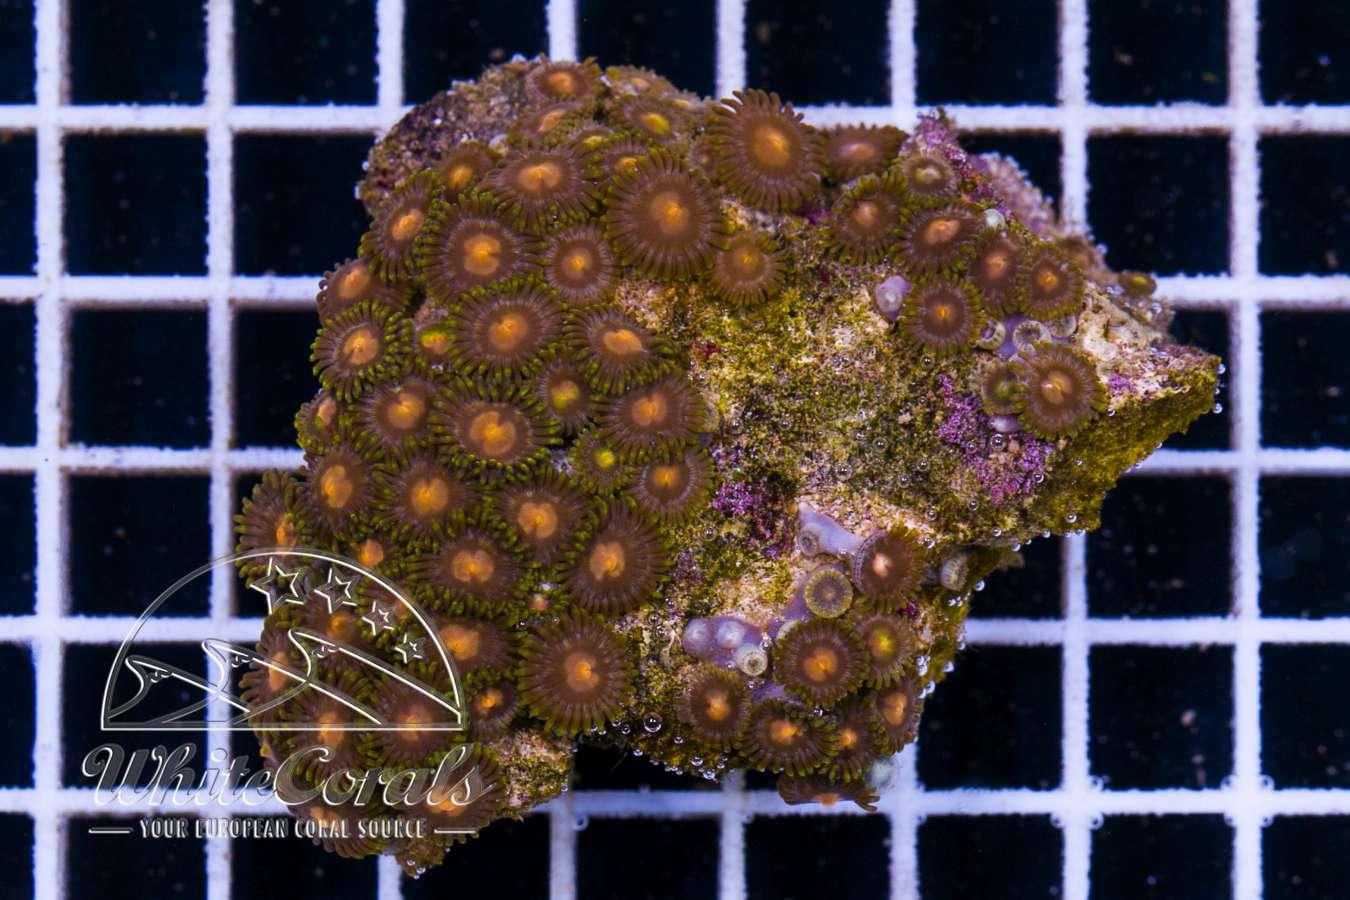 seltene ultra zoanthus krustenanemonen korallen ableger online kaufen. Black Bedroom Furniture Sets. Home Design Ideas